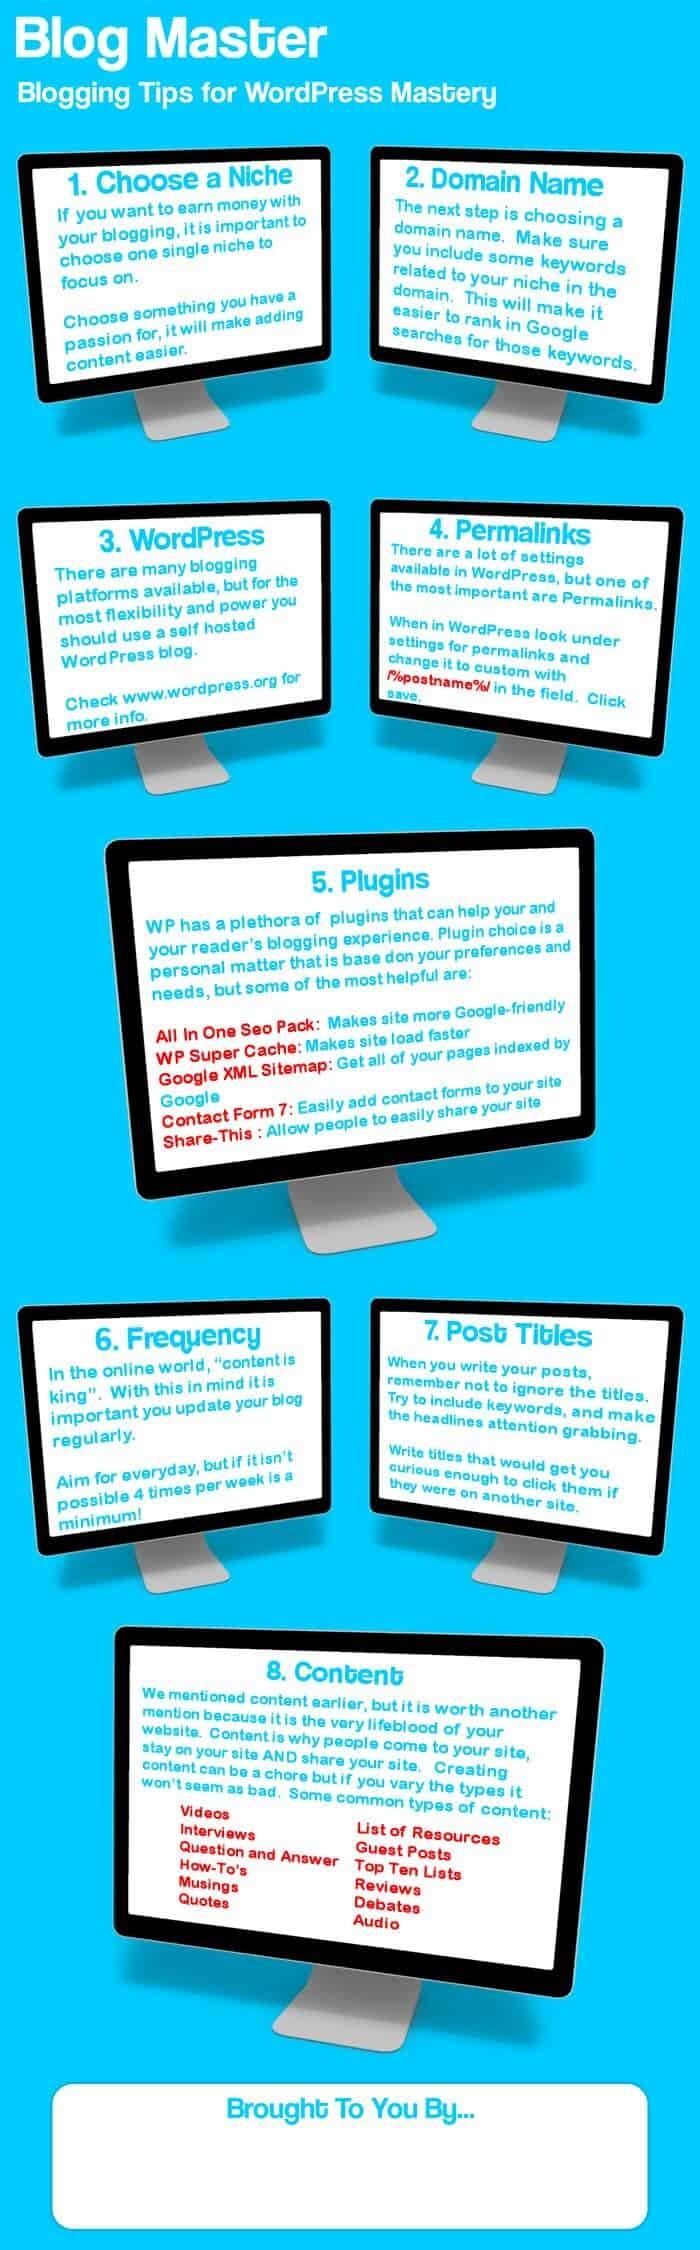 Blog Master Infographic